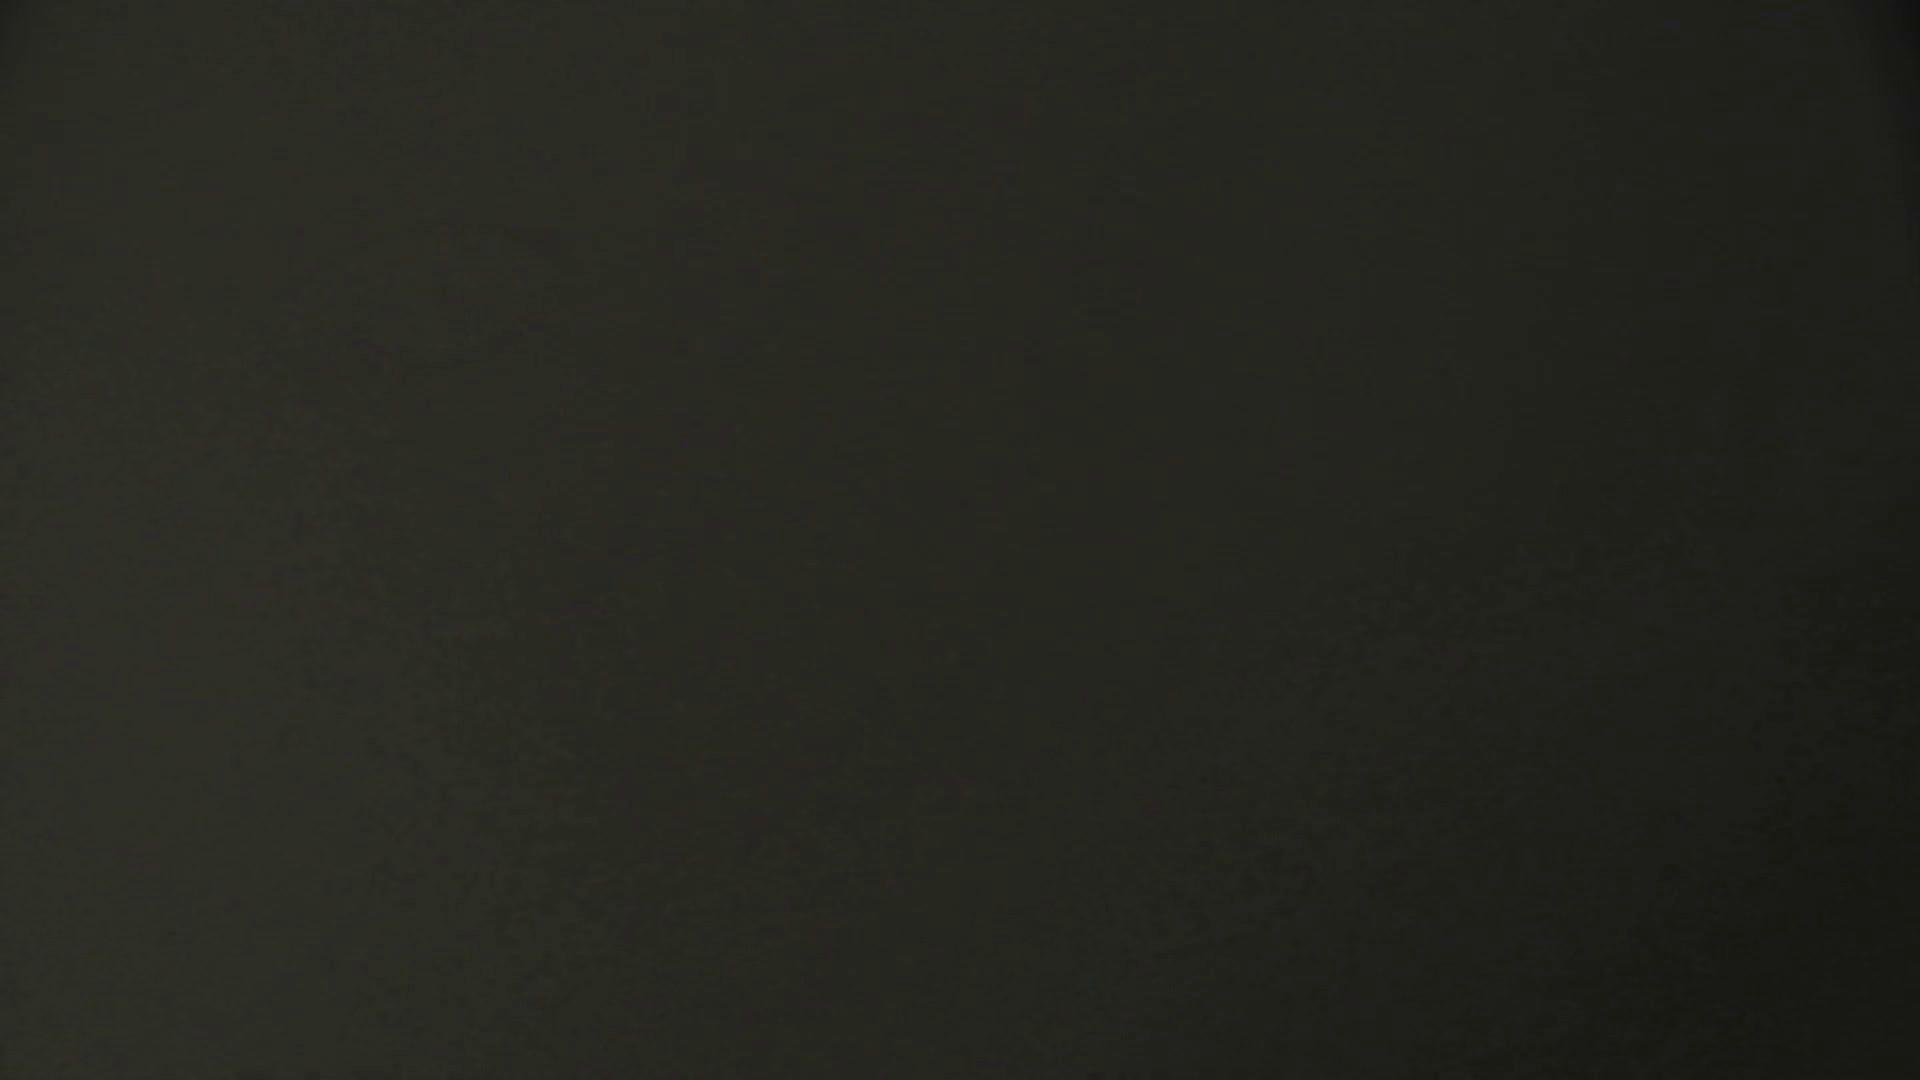 vol.08 命がけ潜伏洗面所! 黒ストッキングが流行りです。 潜入突撃 われめAV動画紹介 95pic 90